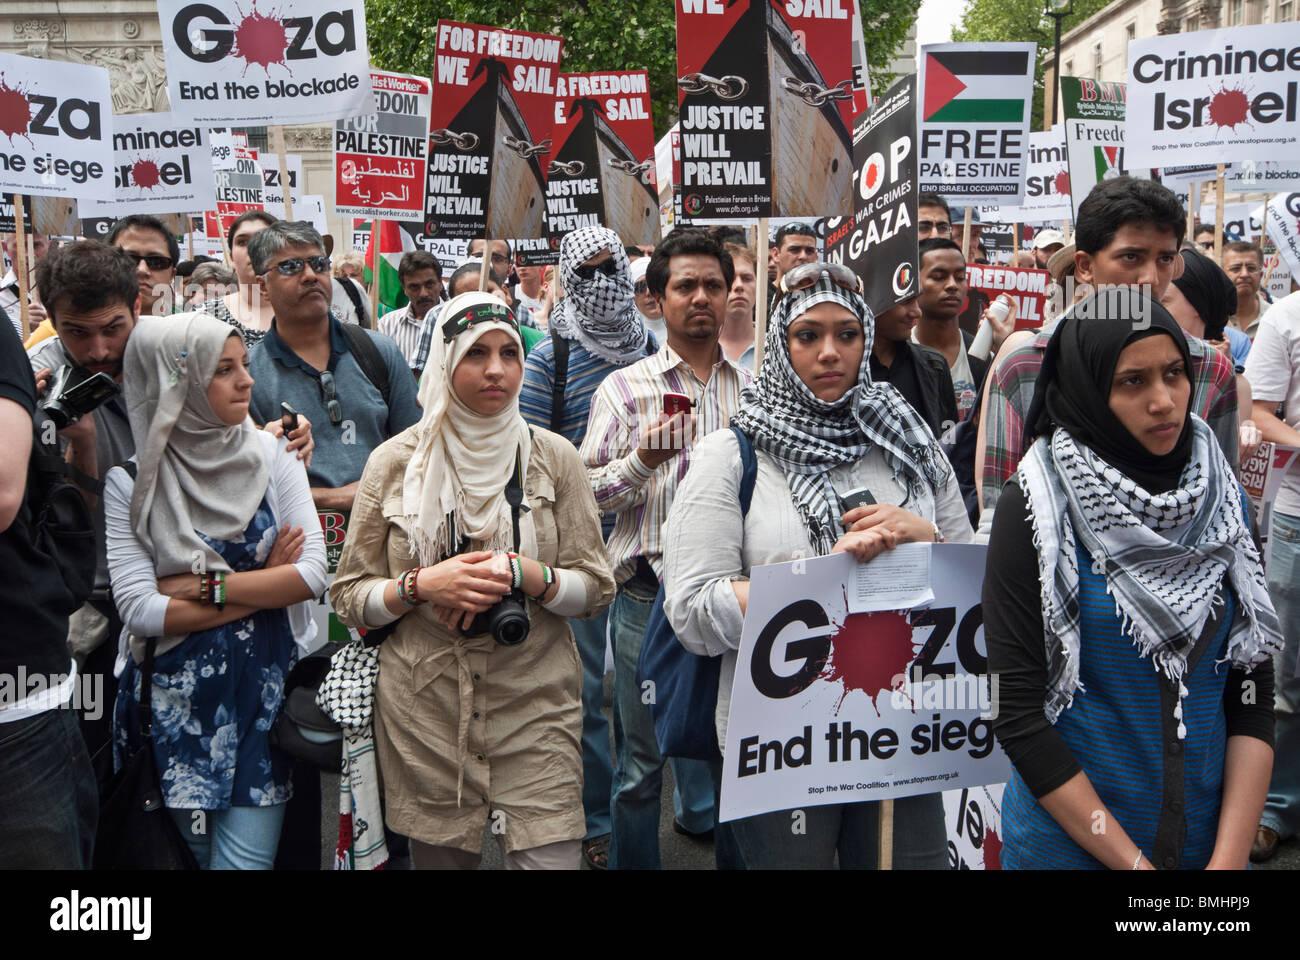 DEMO AGAINST ISRAEL - Stock Image